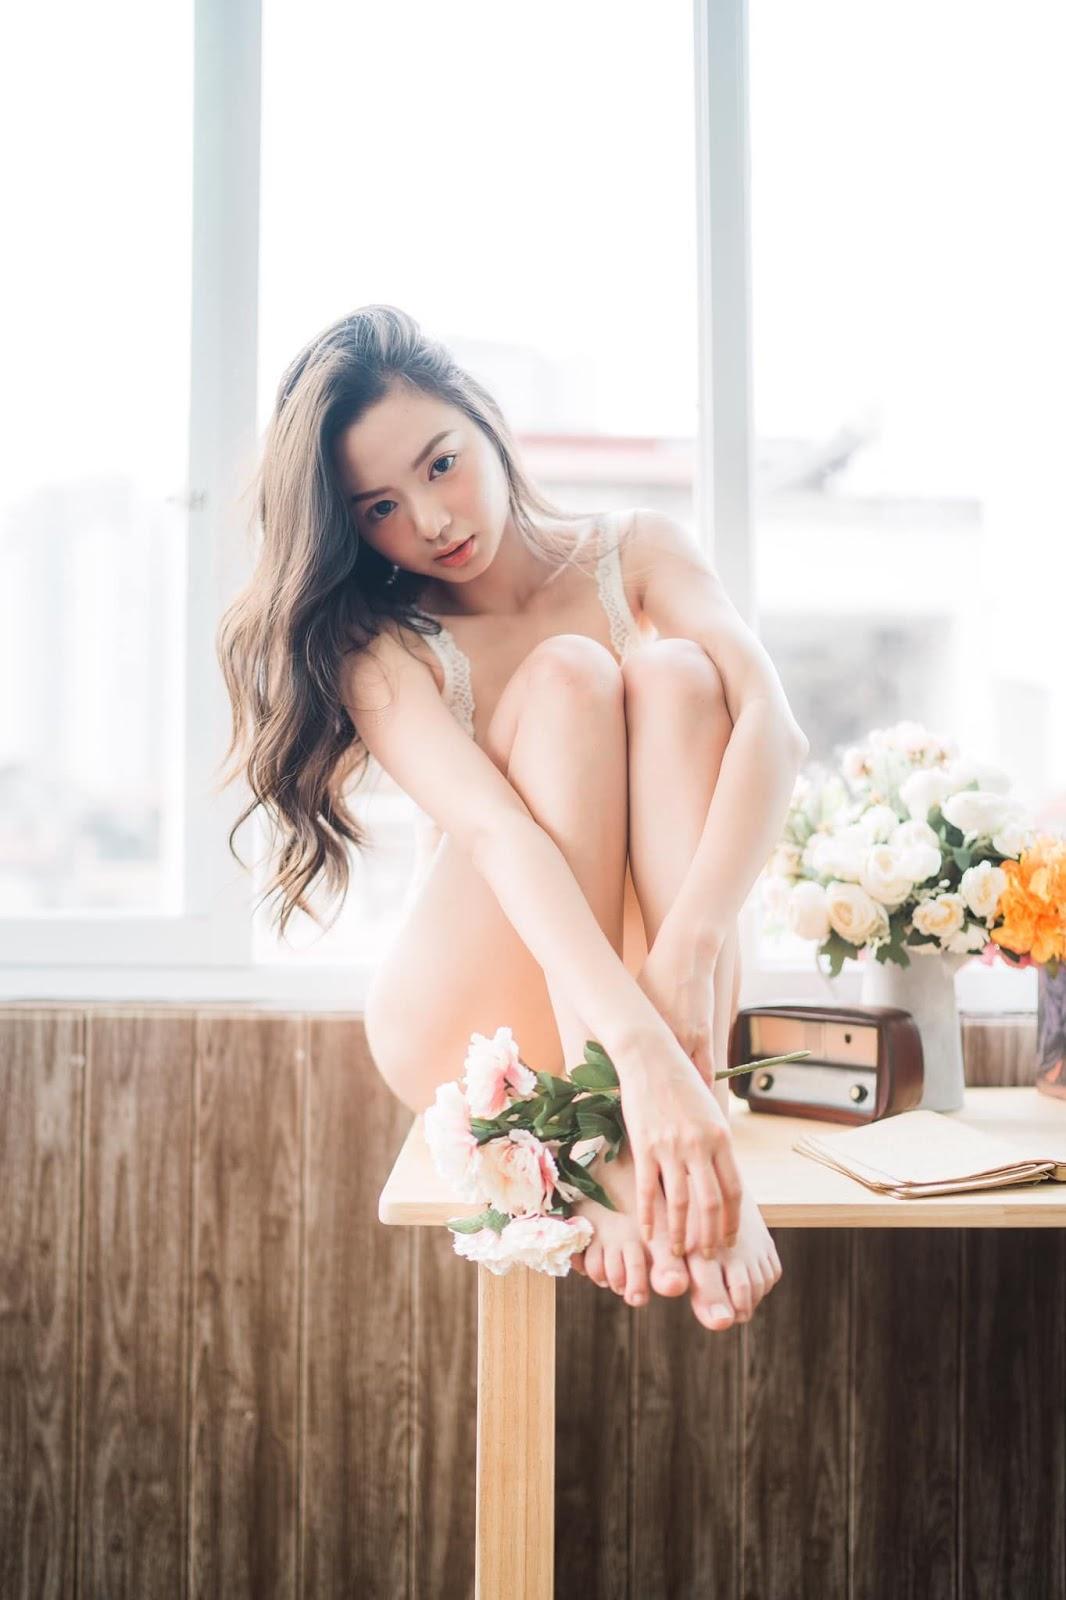 Vietnamese Sexy Model - Vu Ngoc Kim Chi - Beautiful in white - TruePic.net- Picture 22